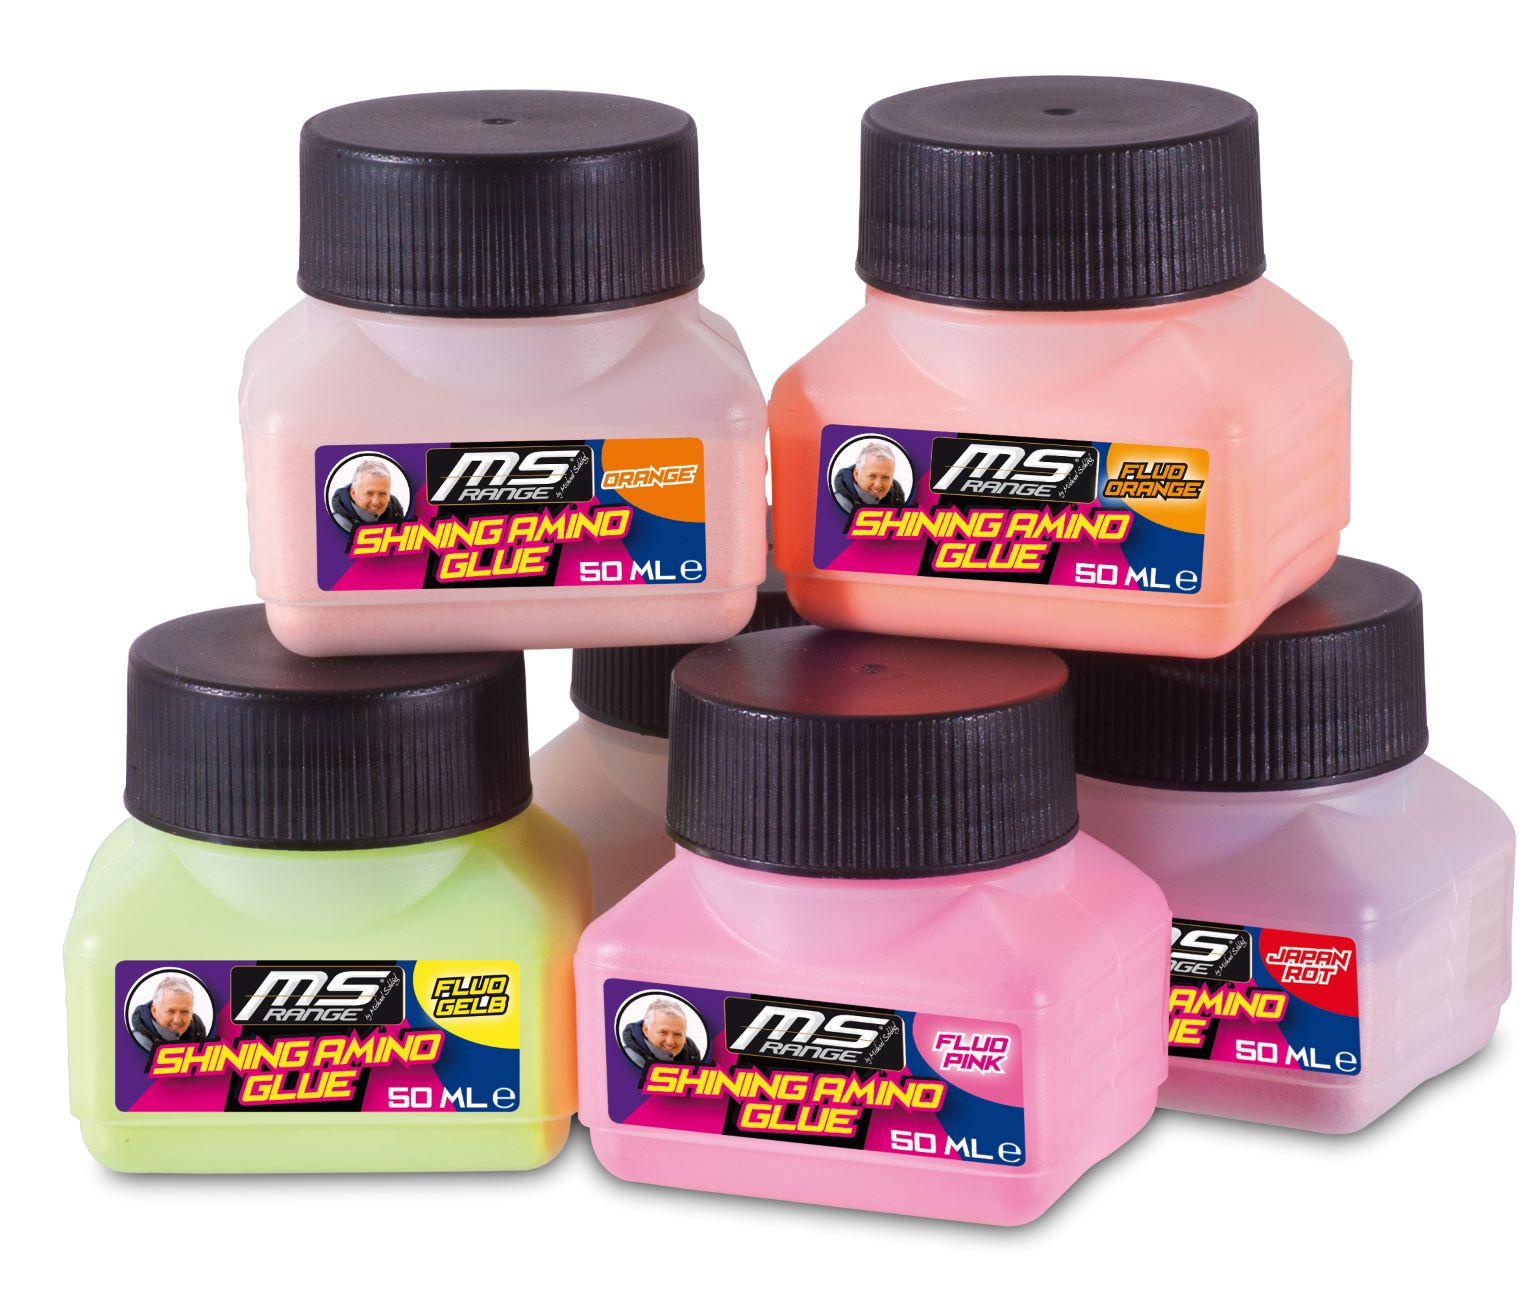 MS Range lepidlo s aminokyselinami Fluo Pink